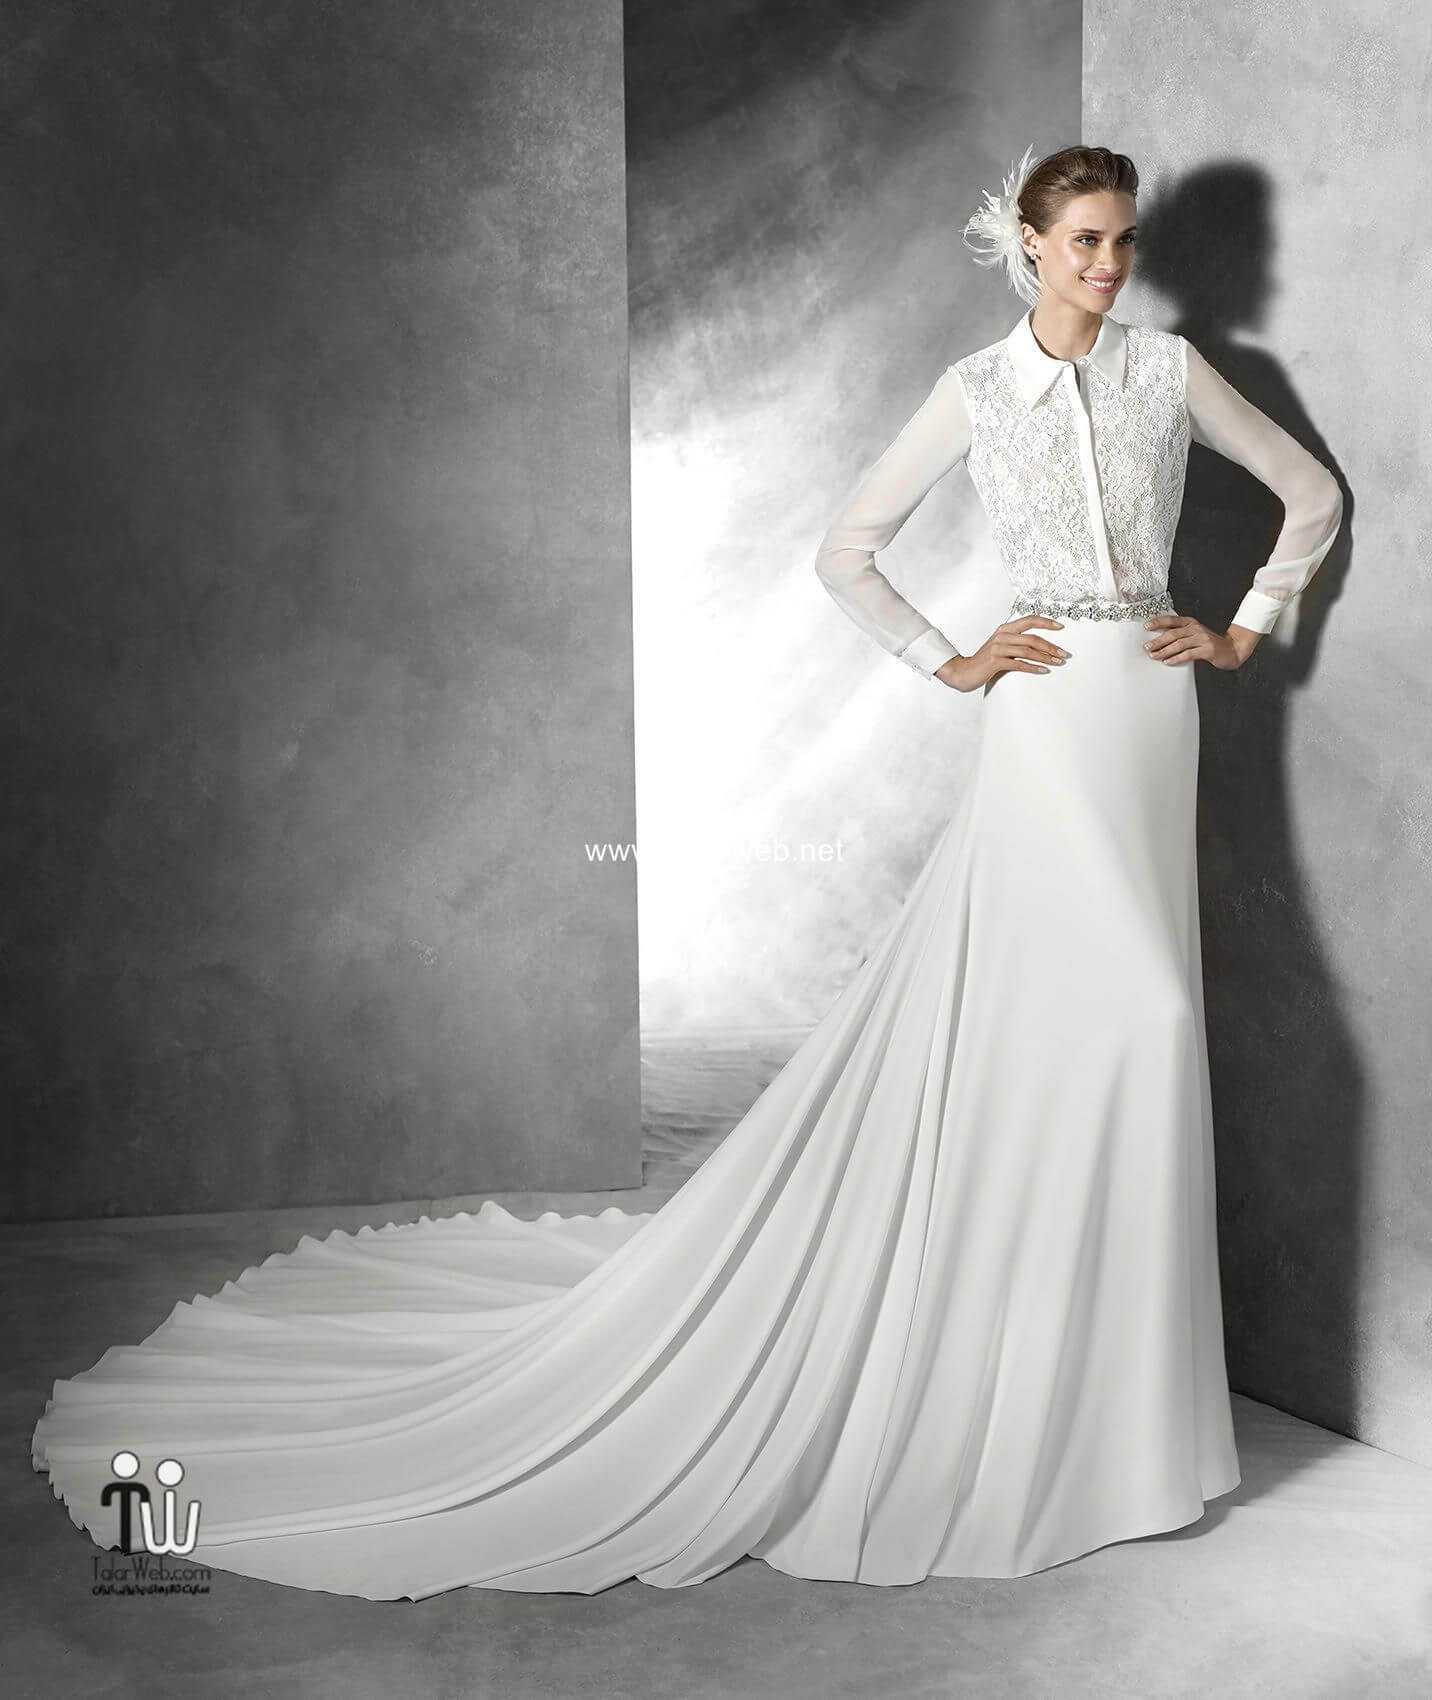 Wedding dresses bridal 2016 13 - مدل لباس عروس ۲۰۱۶ - سری۱